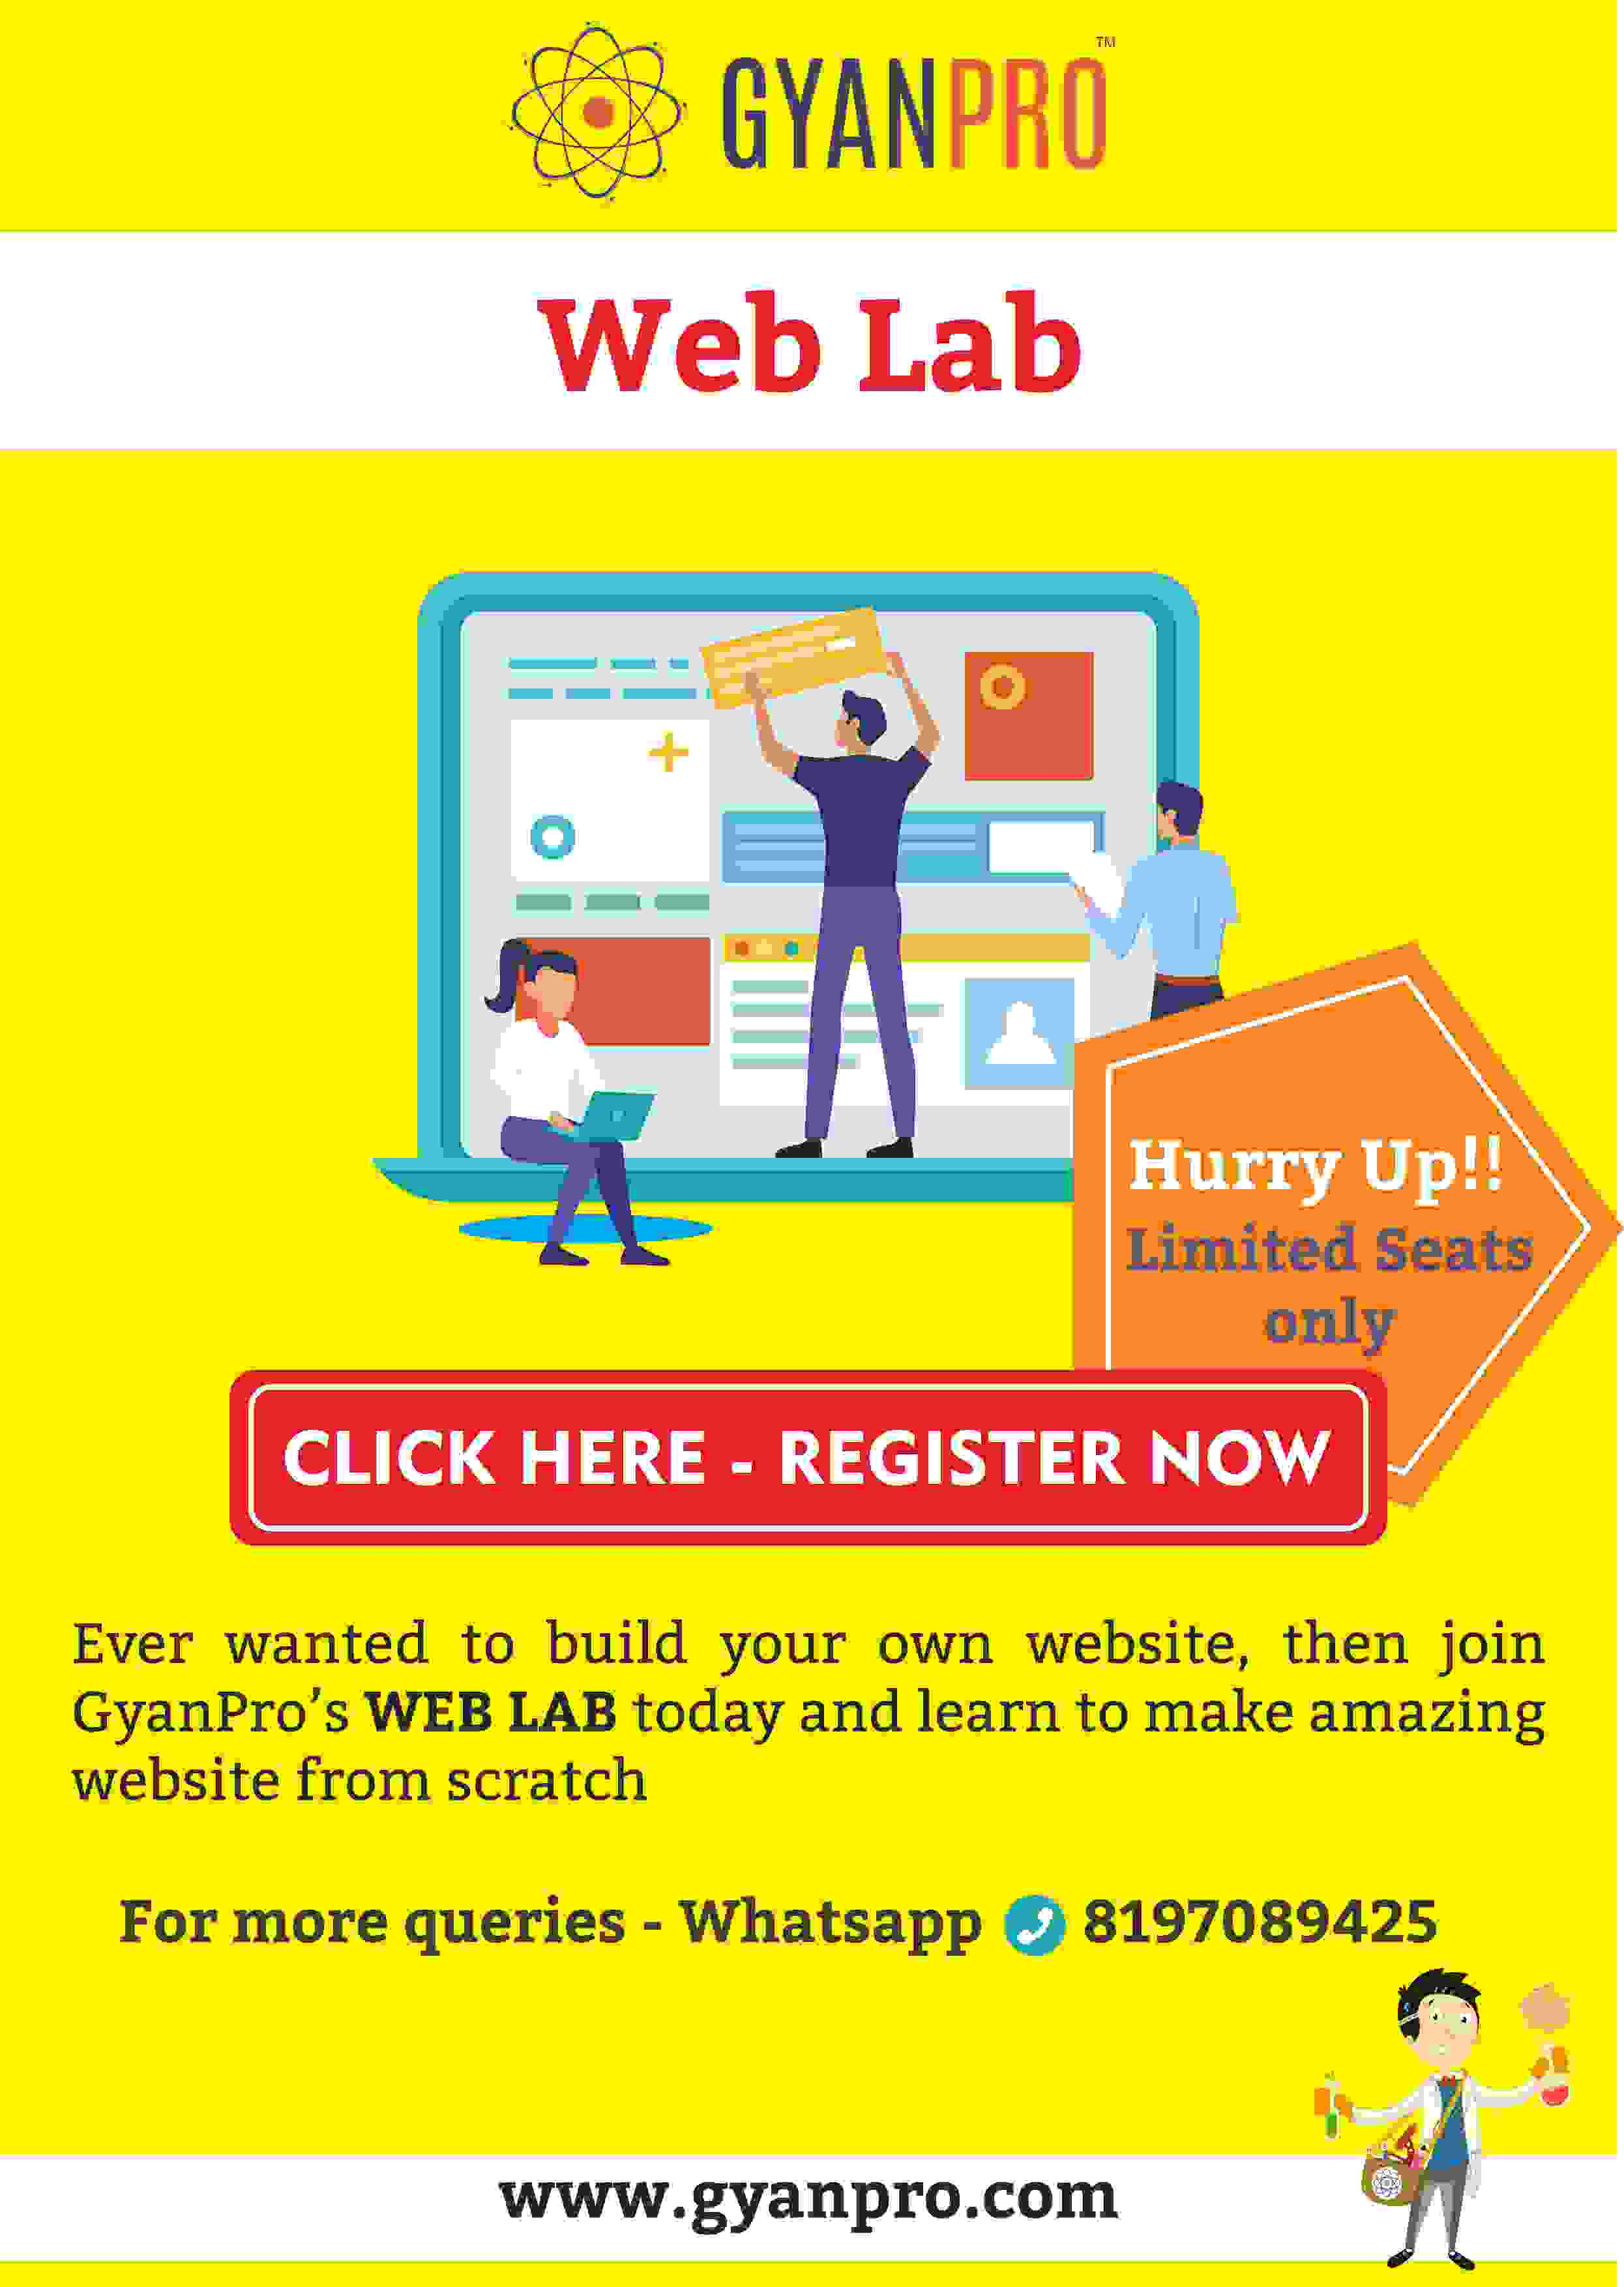 gyanpro_Web lab_poster